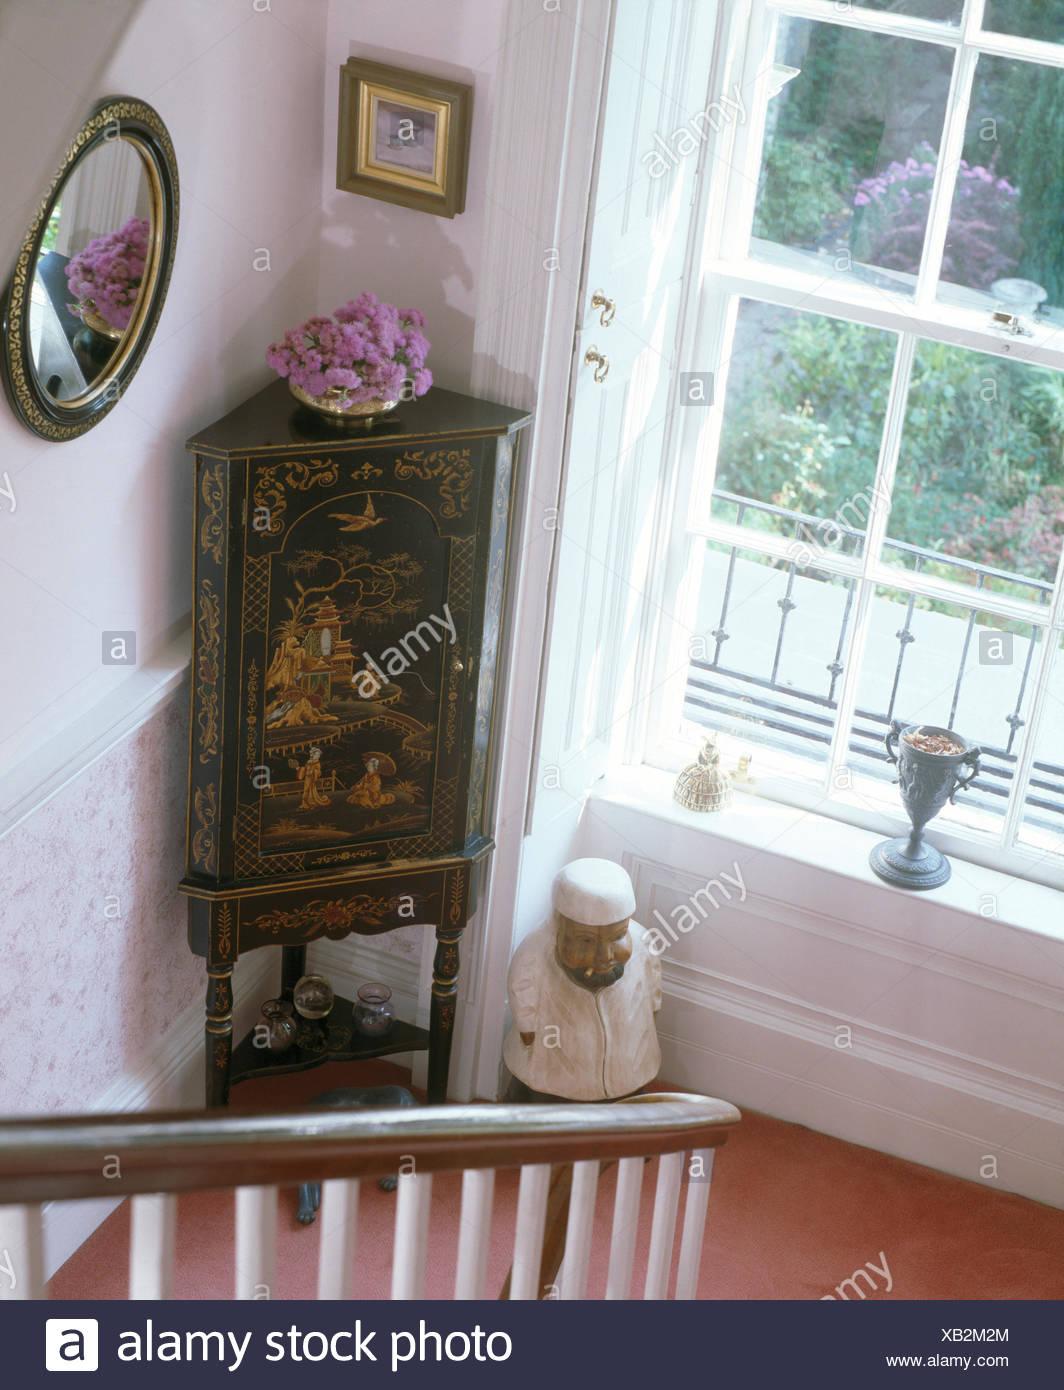 Antique oriental corner cupboard besidew window on small landing - Stock  Image - Oriental Antique Furniture Stock Photos & Oriental Antique Furniture